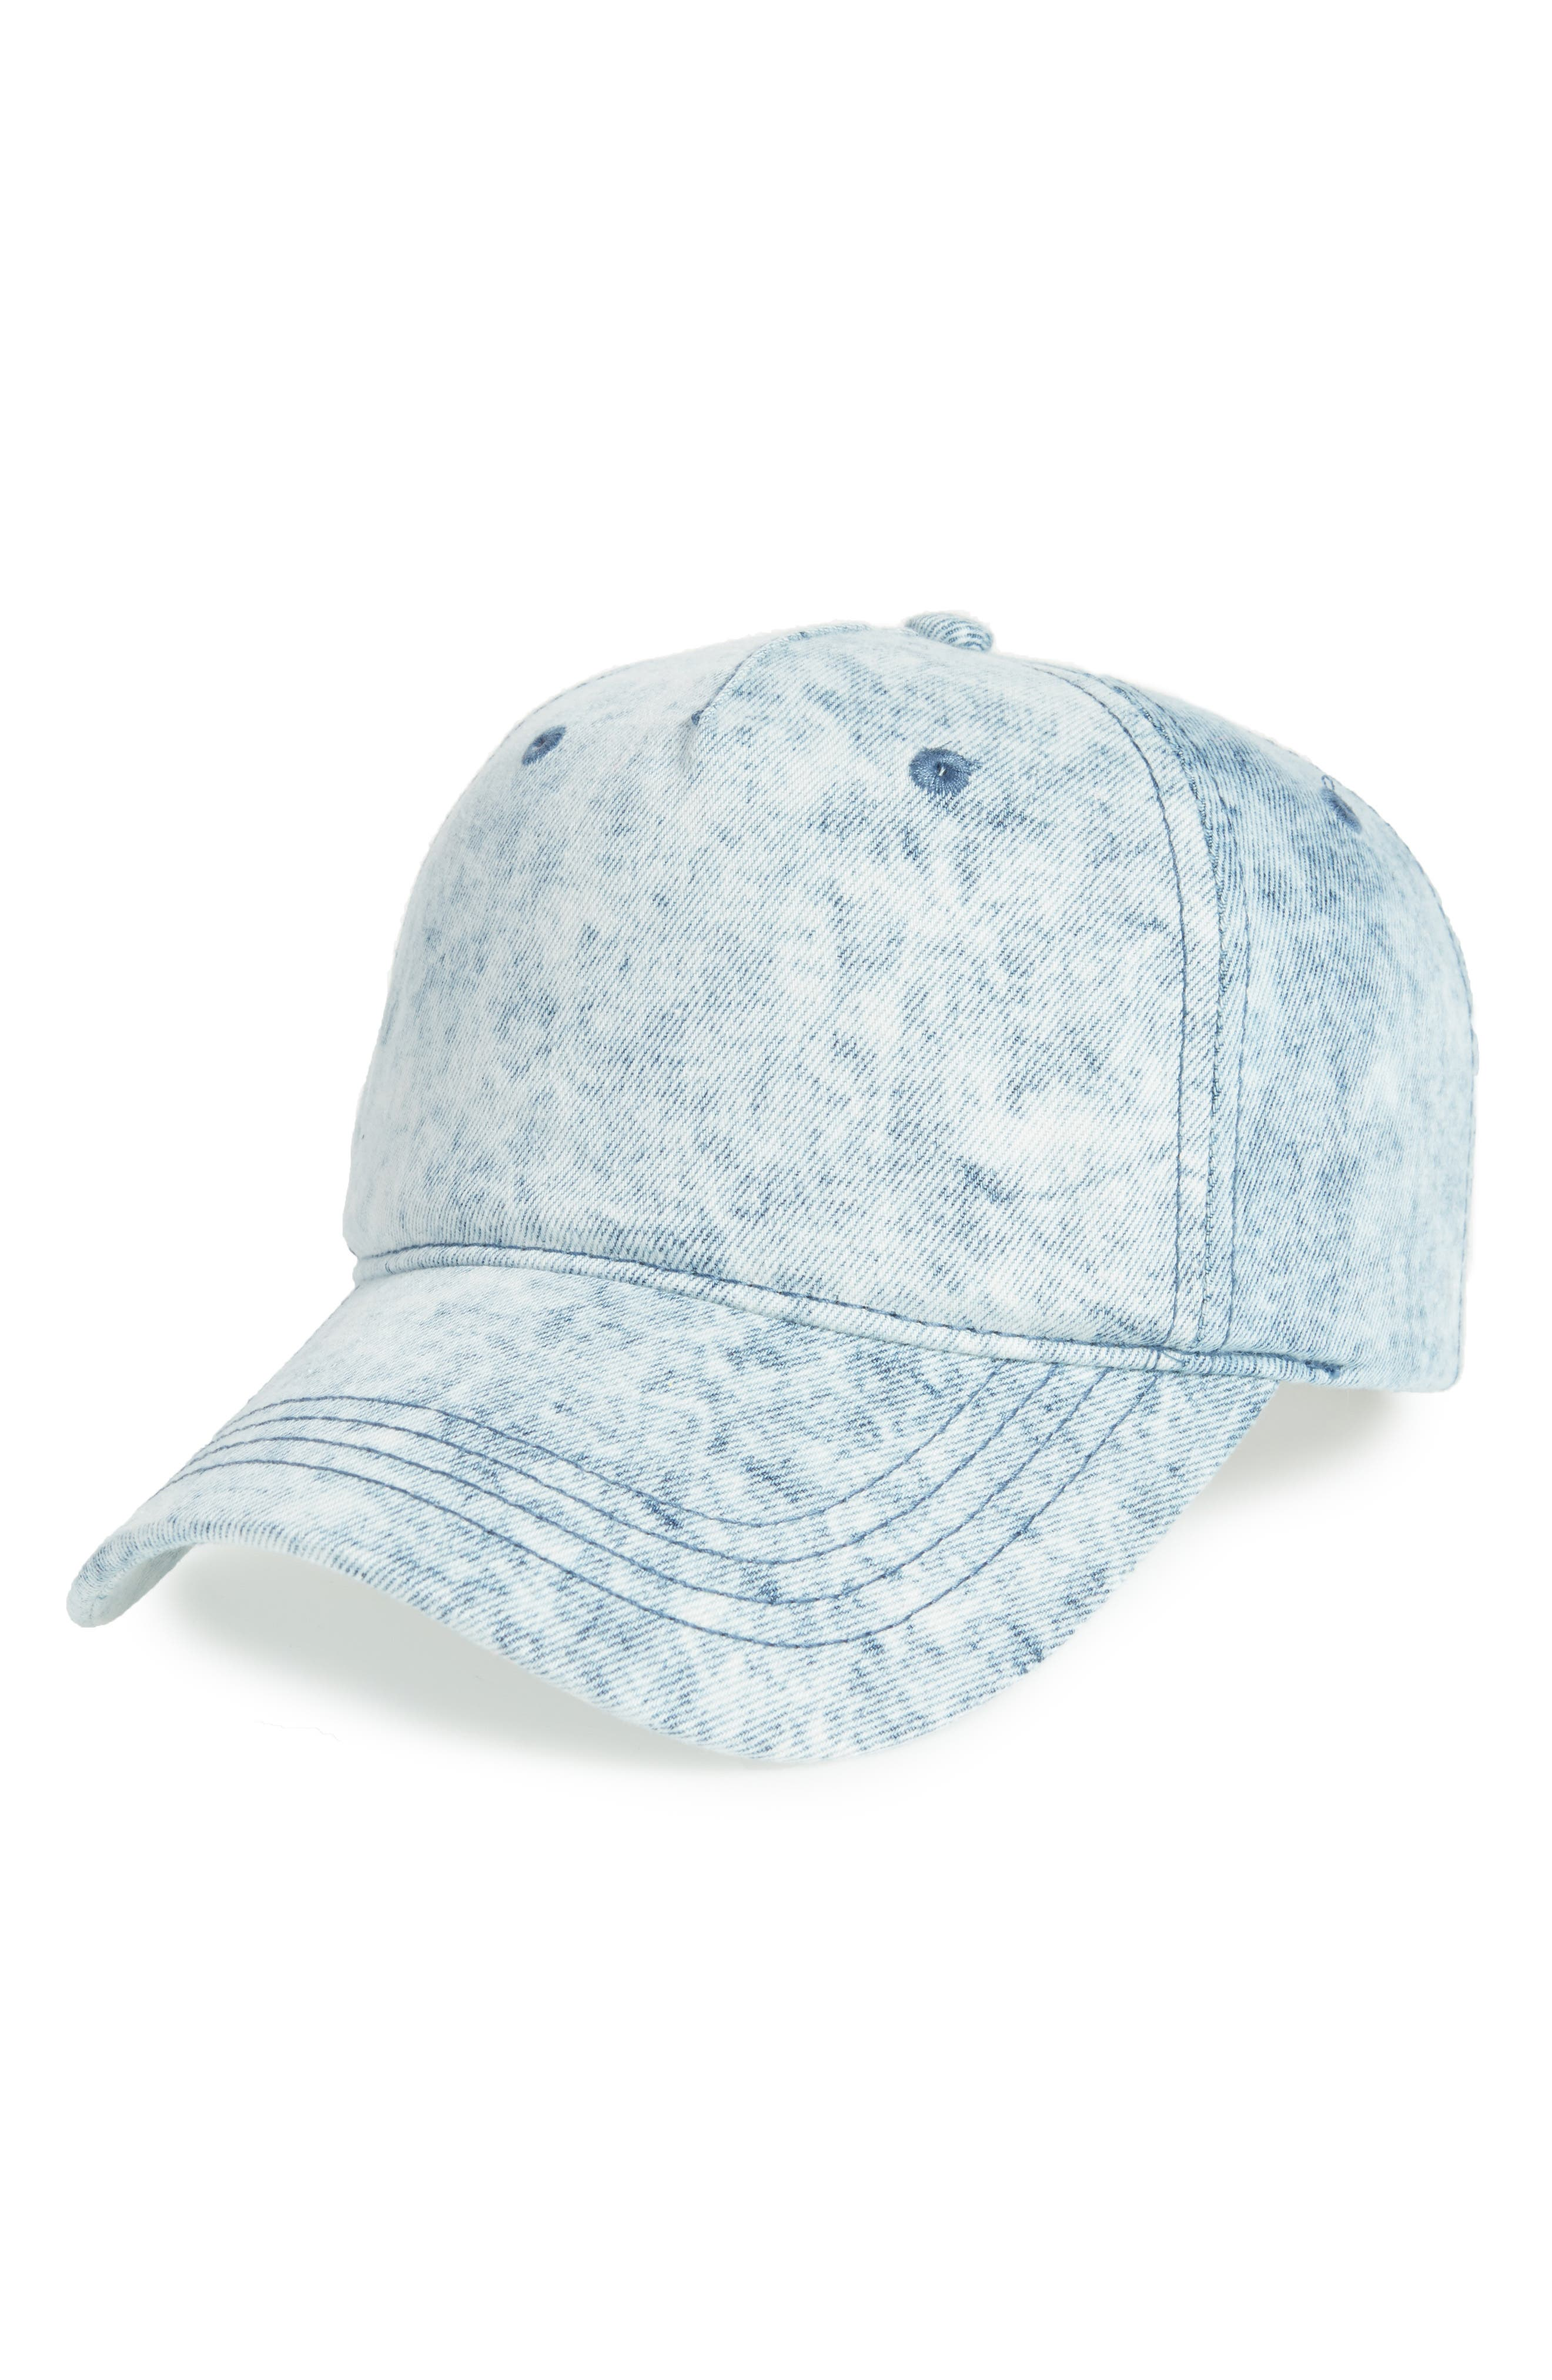 Denim Cap,                         Main,                         color, Blue